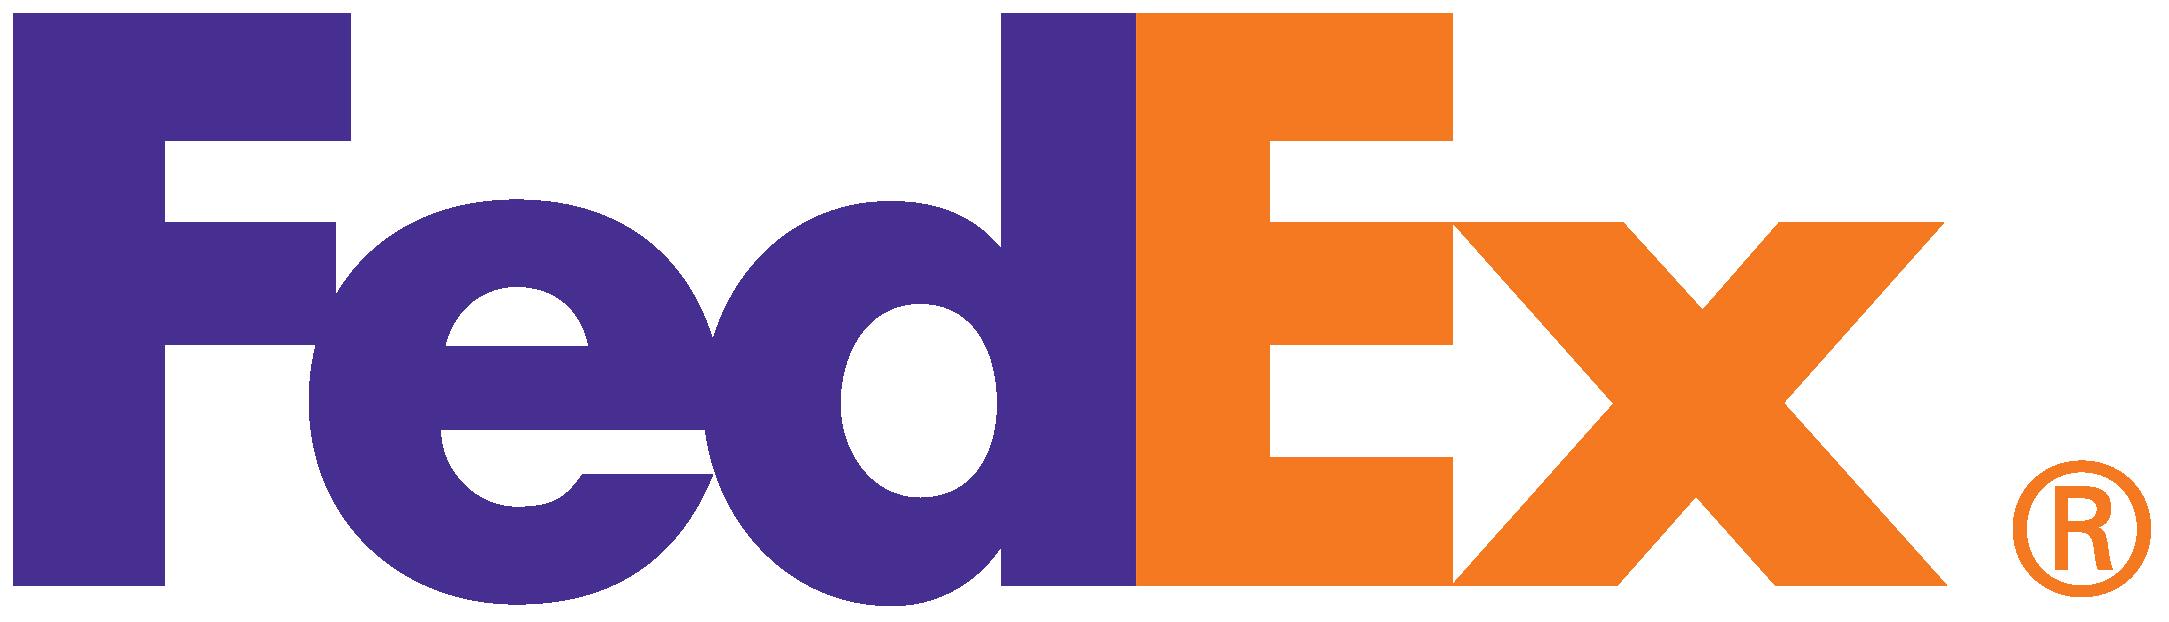 FedEx logo design secrets and best practices